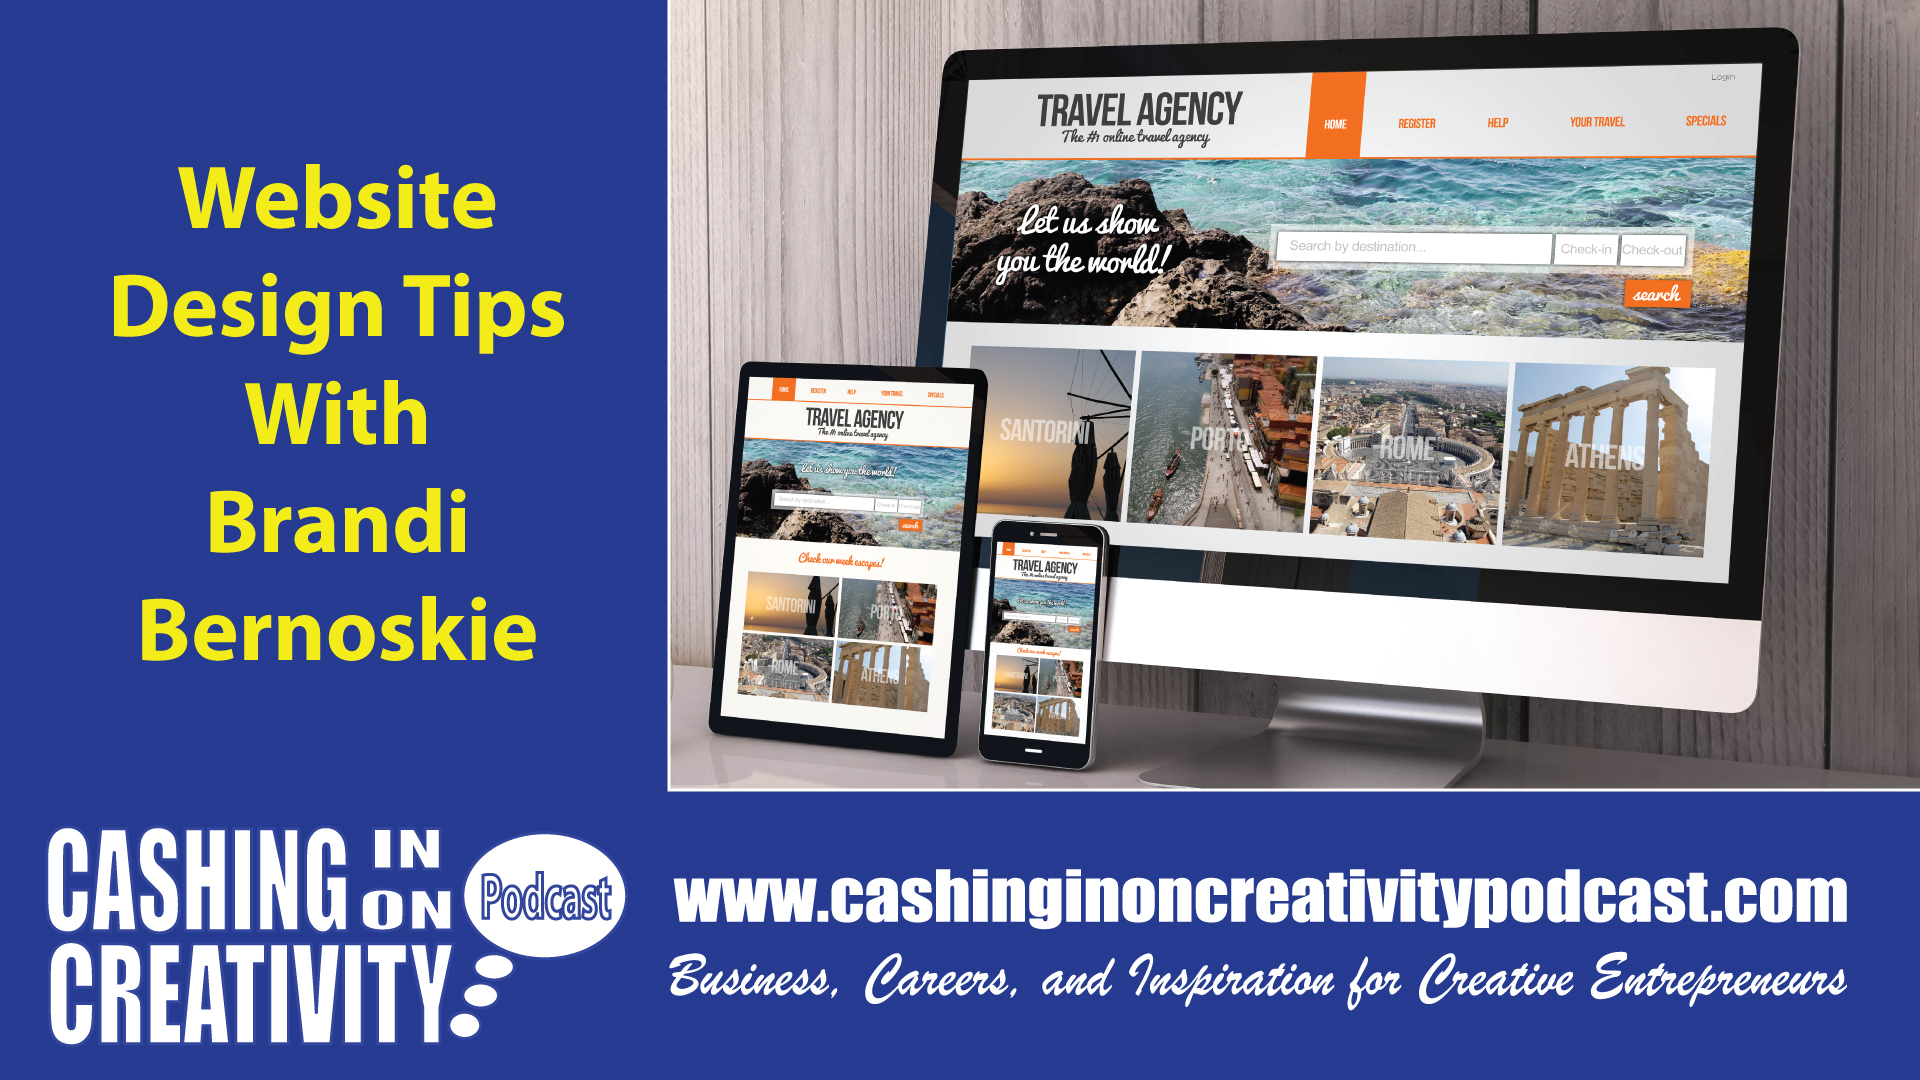 CC242 Website Design for Creative Entrepreneurs with Brandi Bernoskie